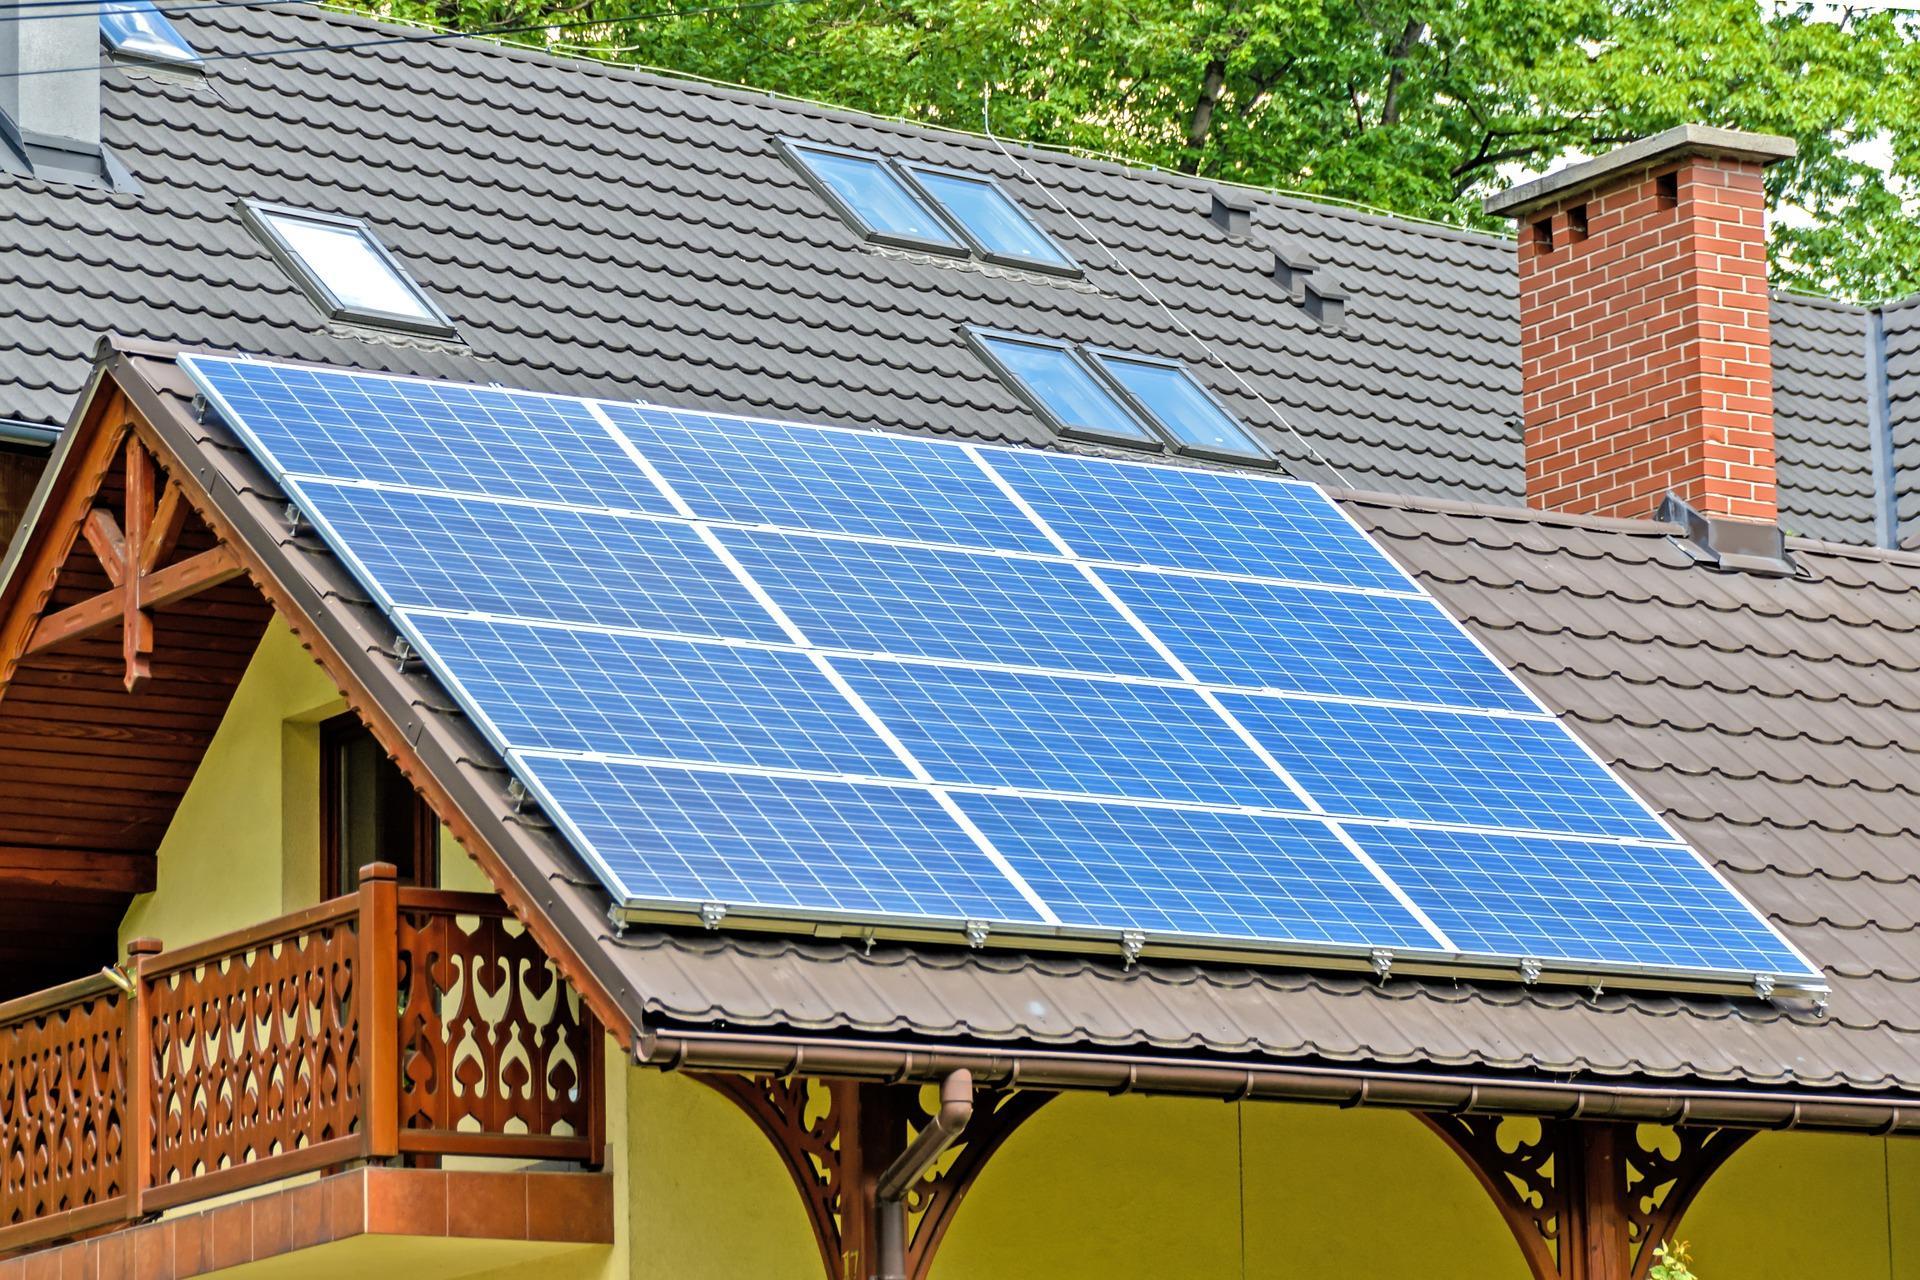 solar-panels-1477987_1920-1493996070564.jpg